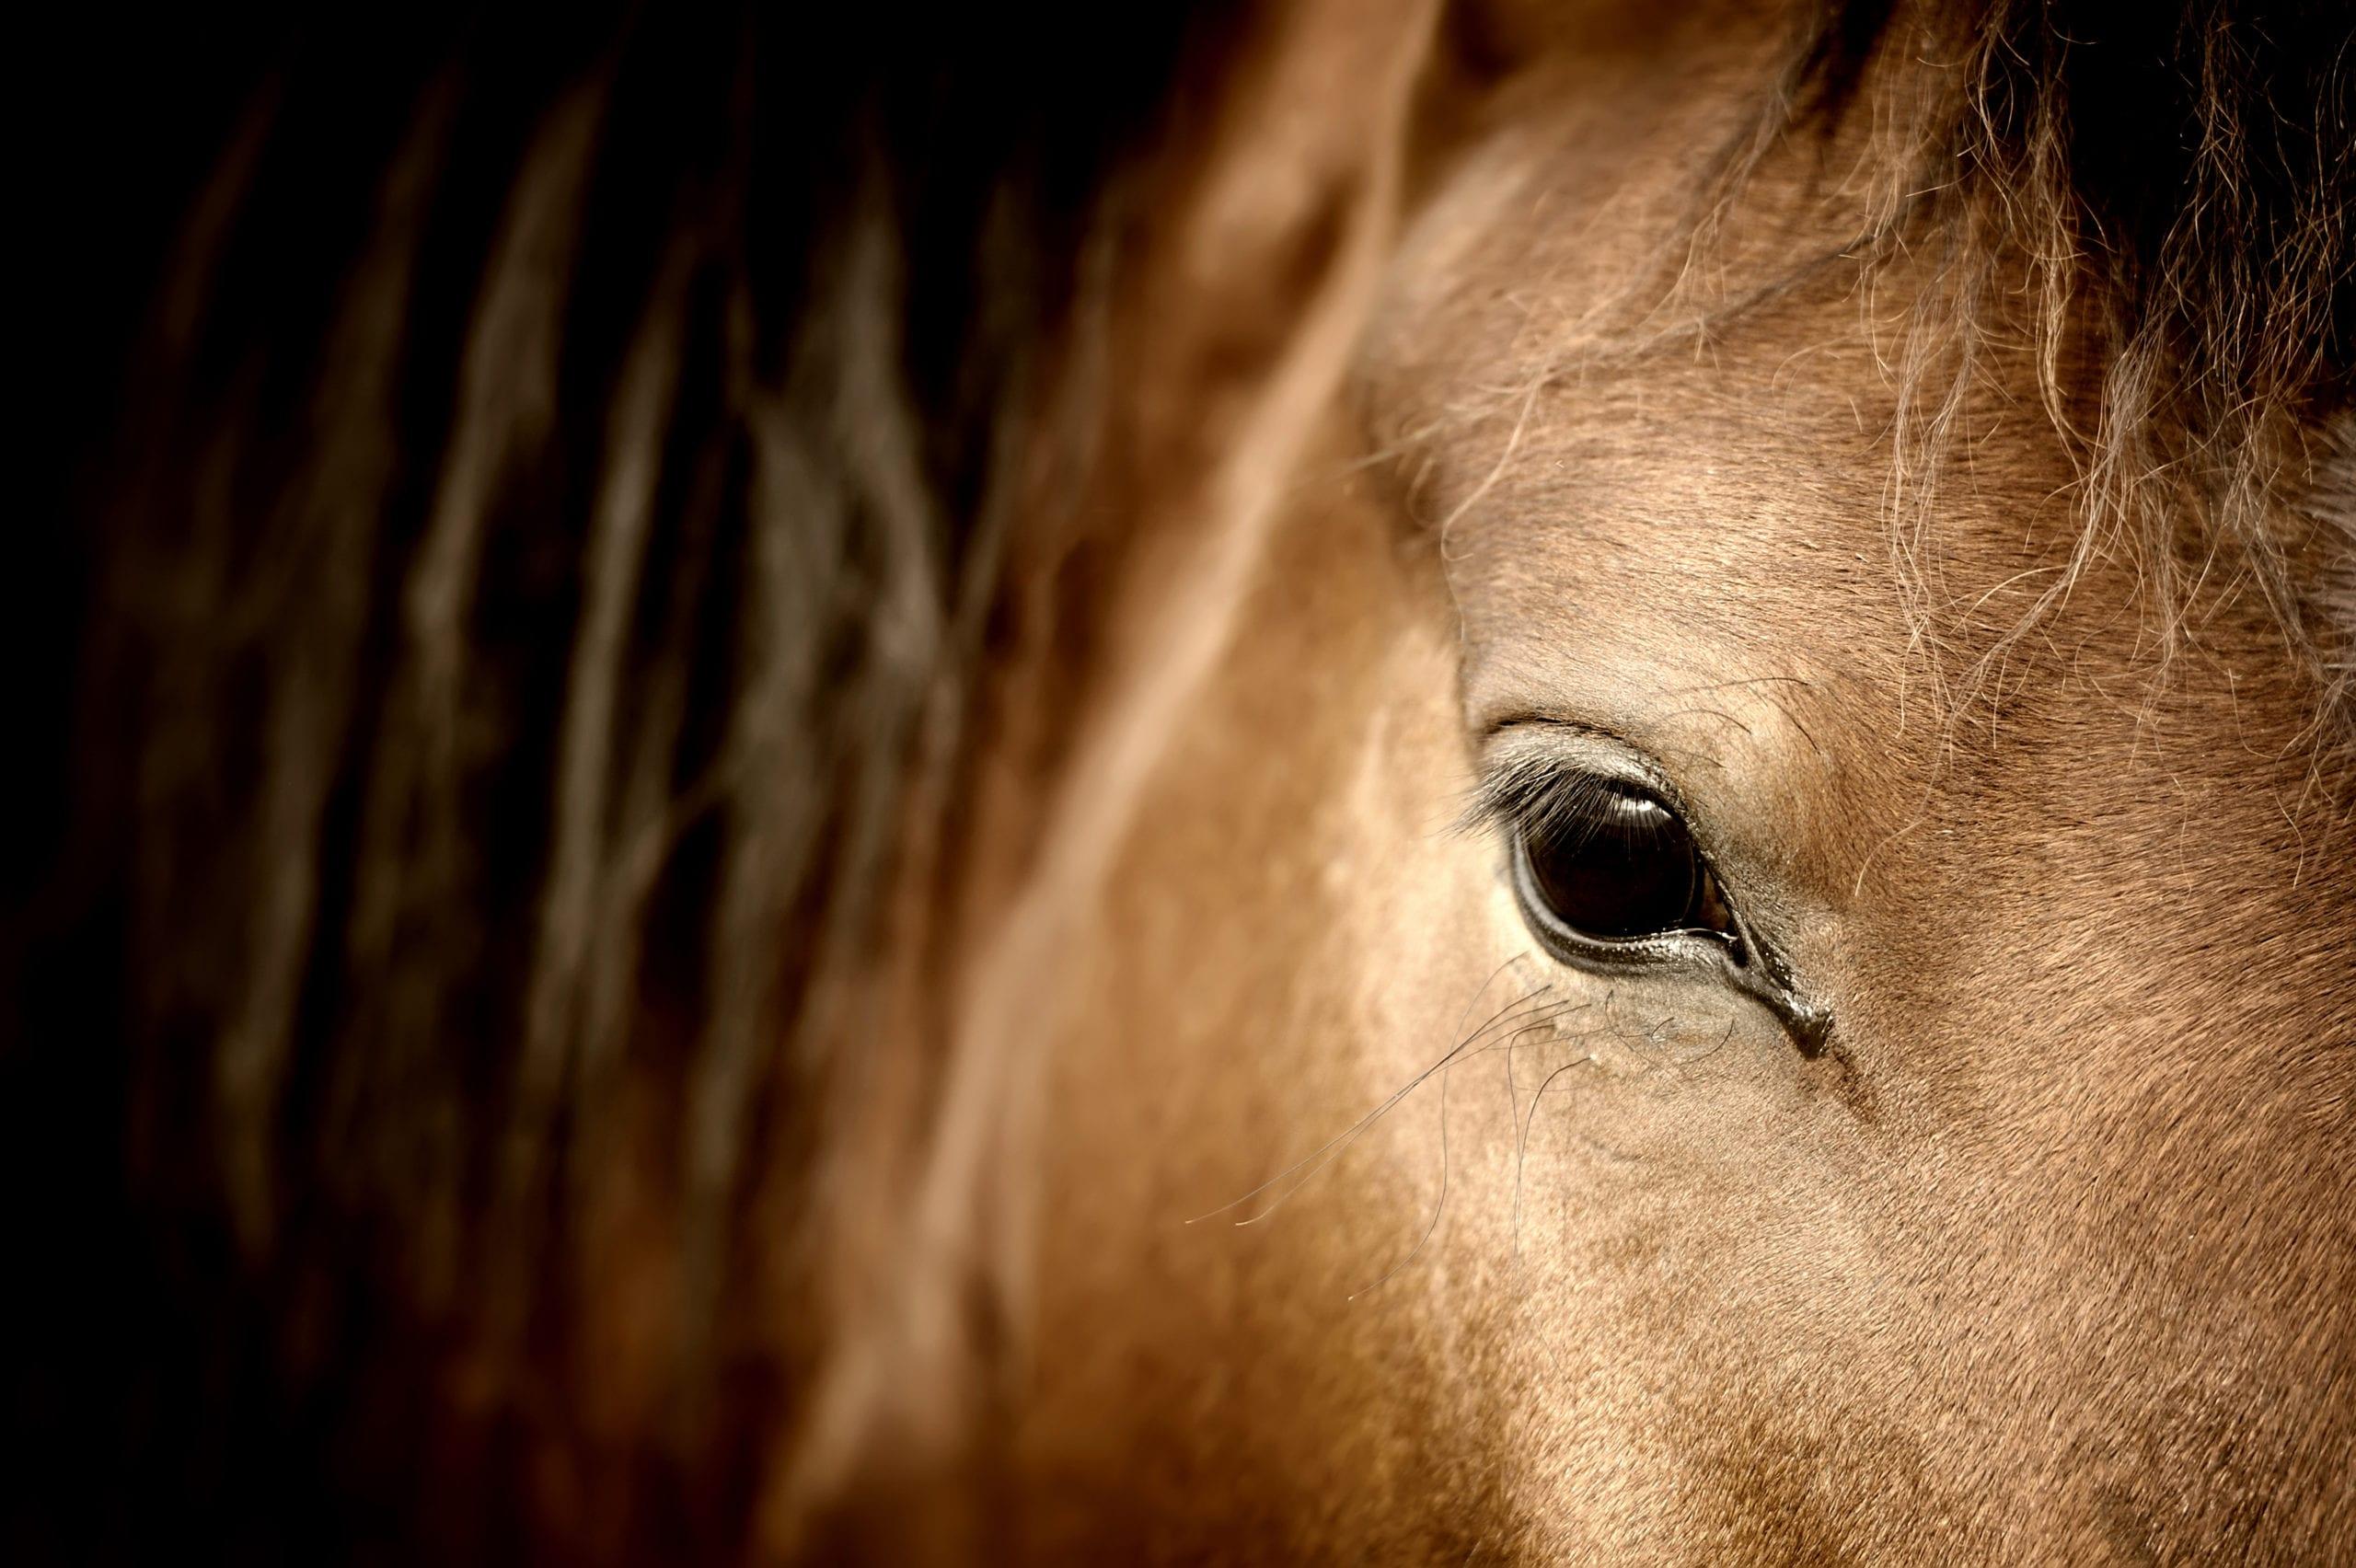 Hest i trening hos Venavind trener 1 Therese Heramb